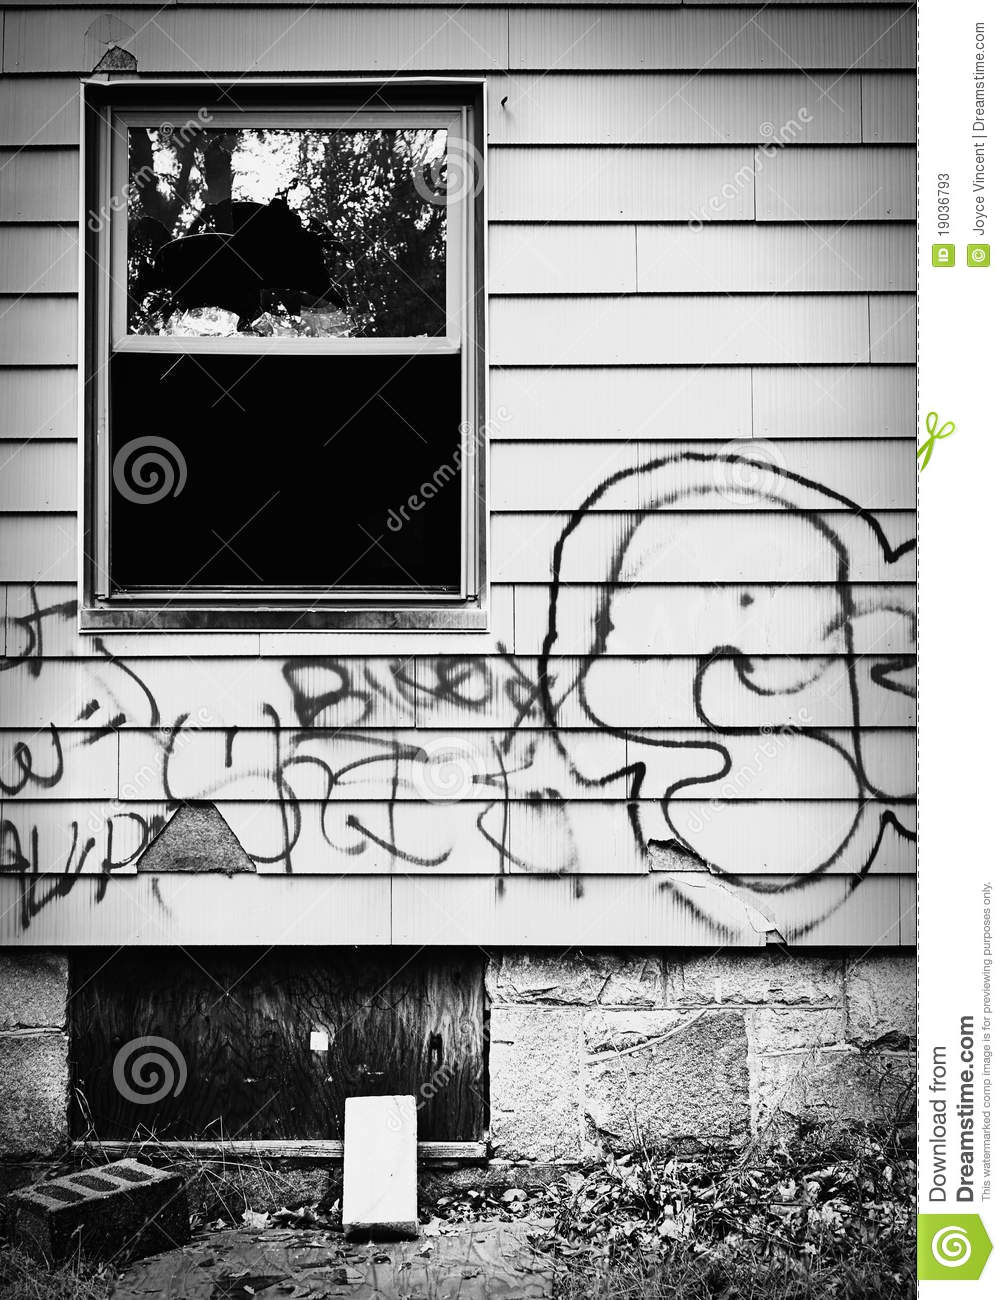 Graffiti home clipart.